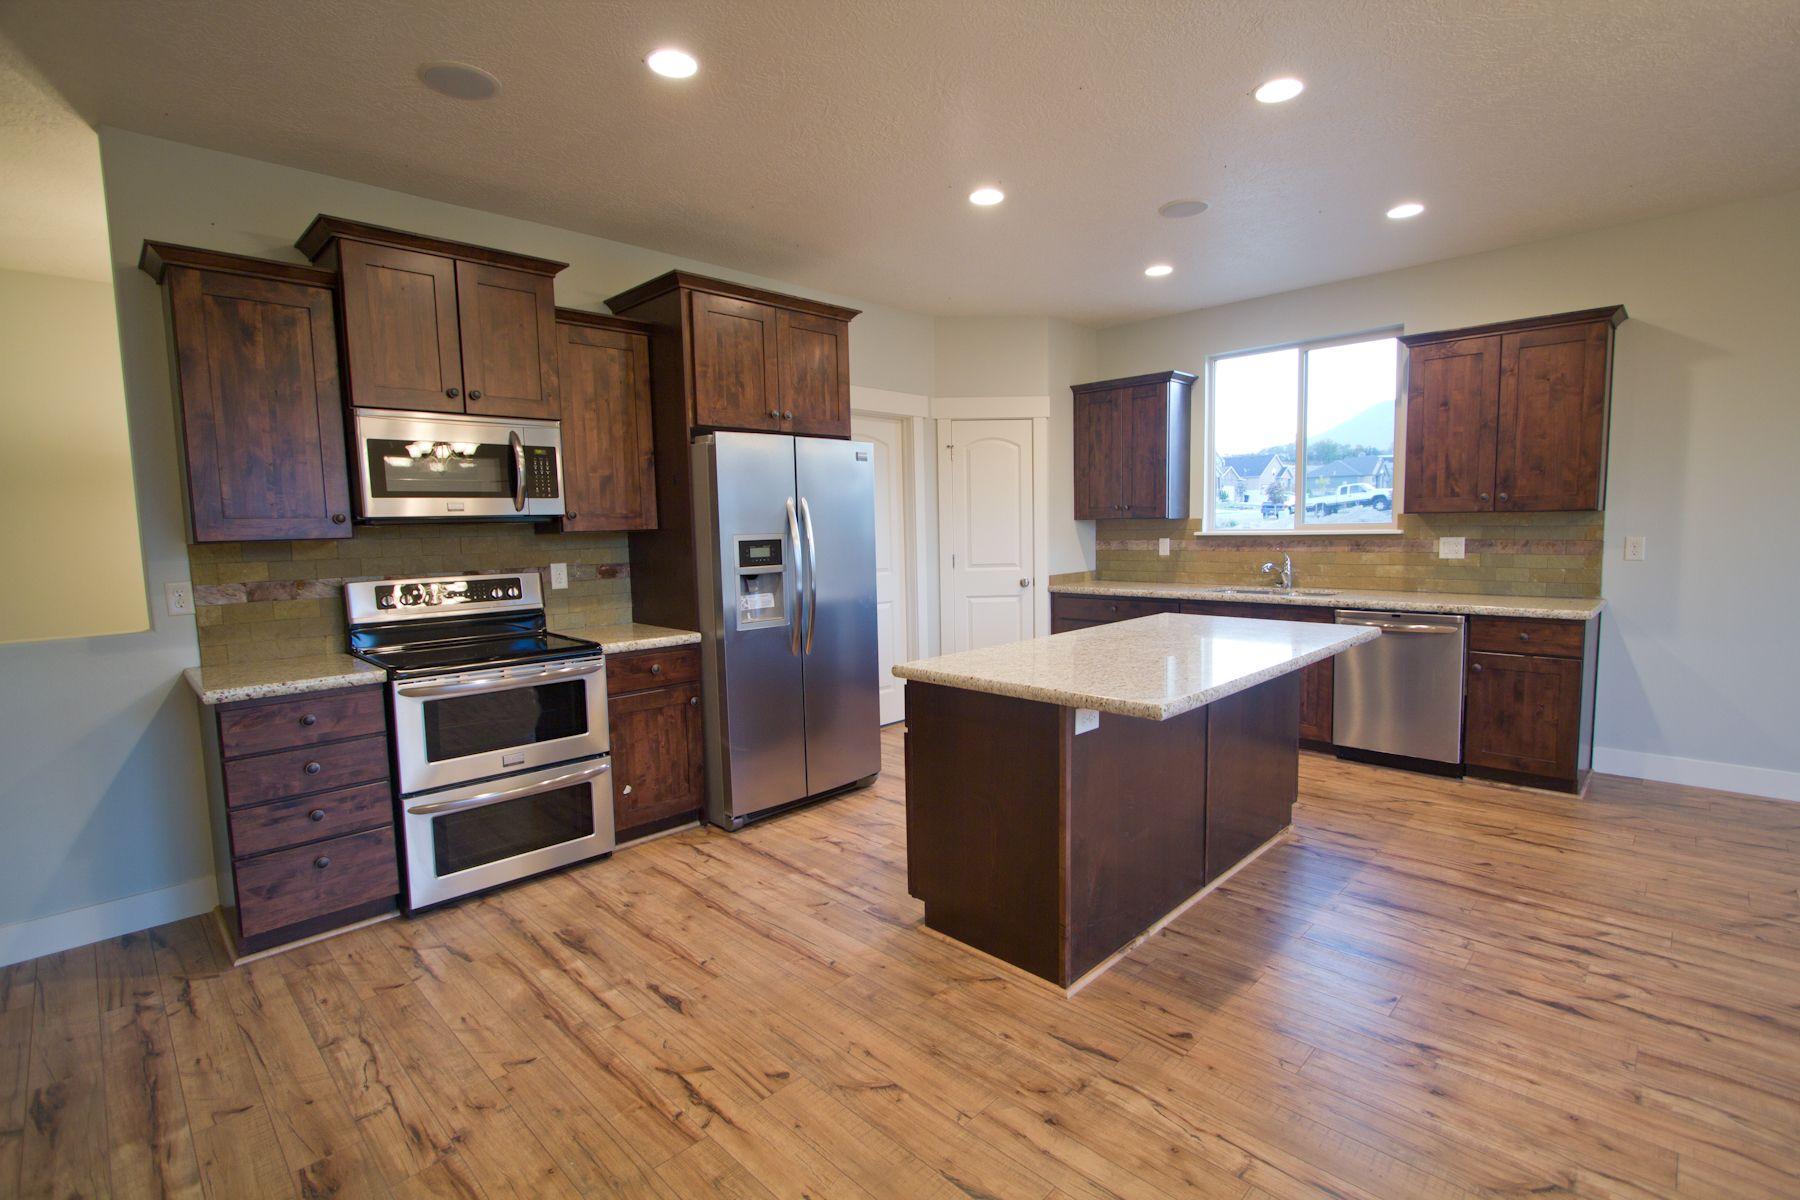 Laminate Flooring With Dark Cabinets Rqeqxnph